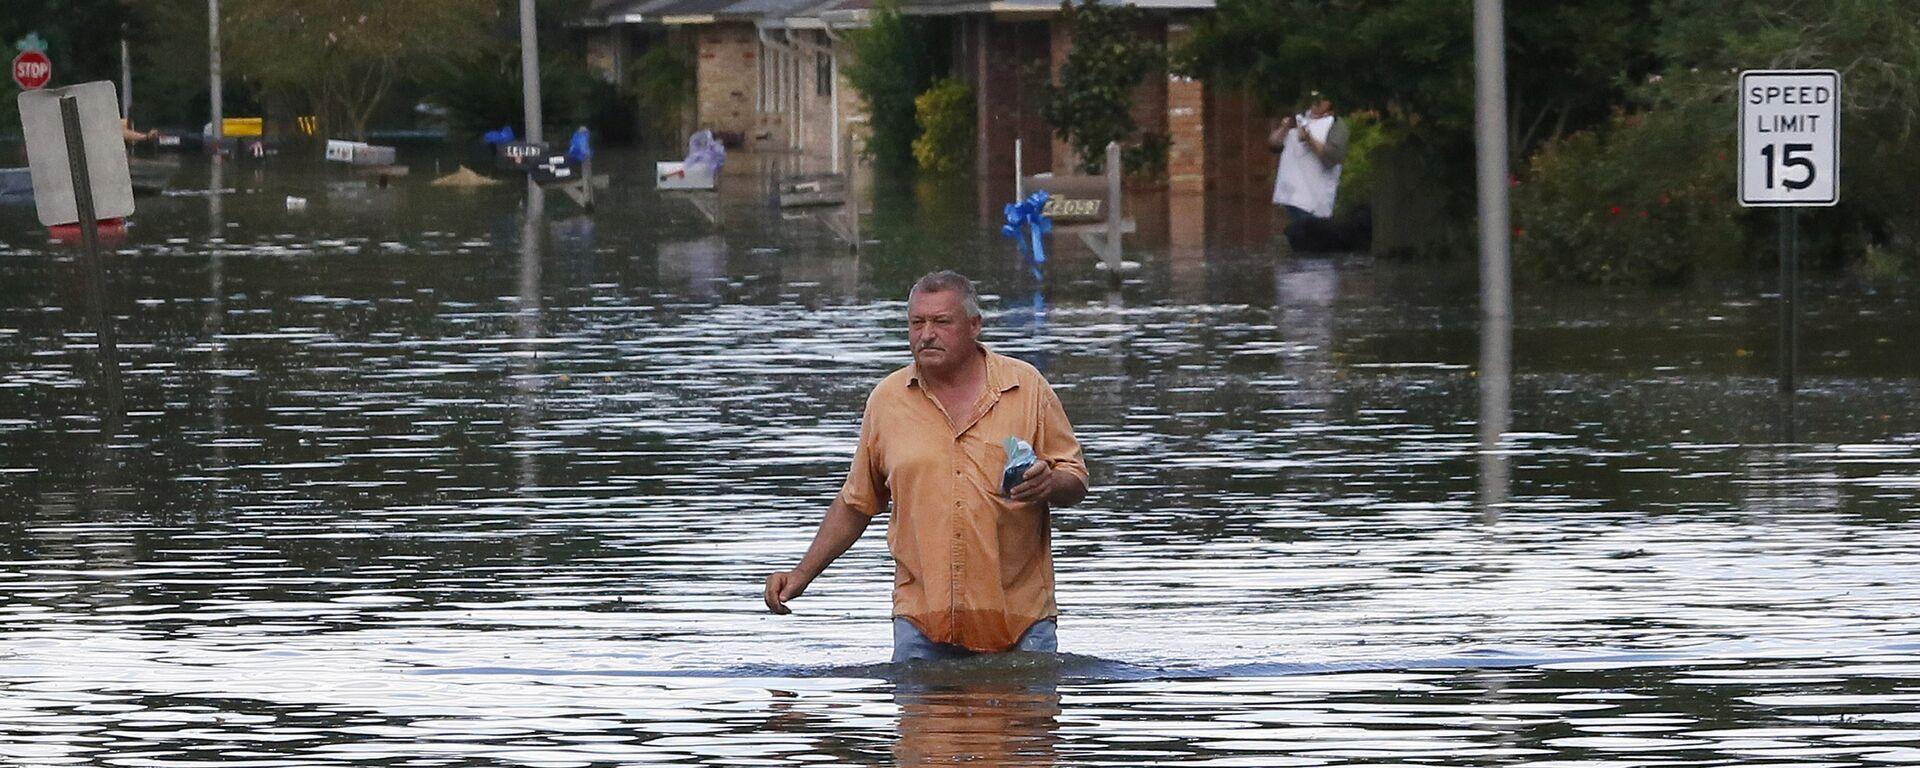 Inundaciones en Luisiana, EEUU - Sputnik Mundo, 1920, 13.09.2021